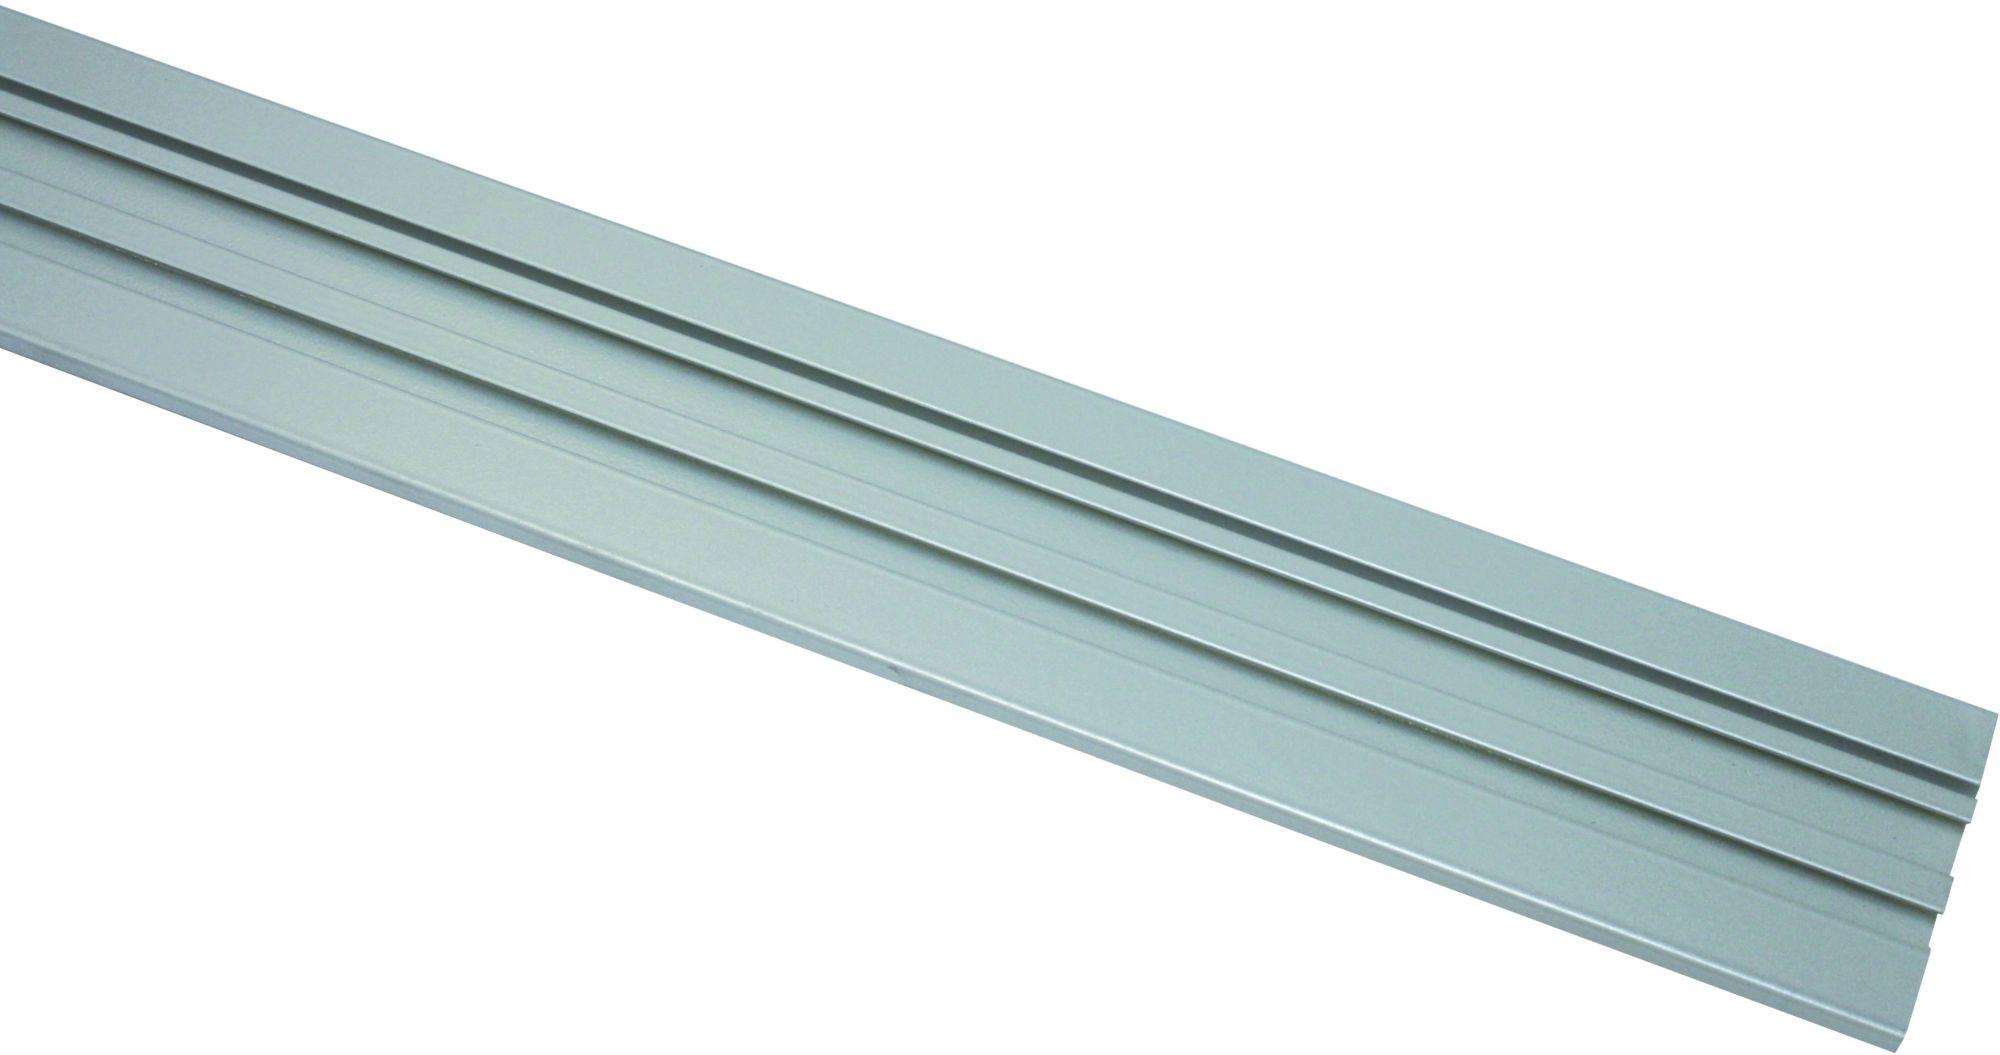 GARDINIA Gardinenschiene, Gardinia, »Aluminium«, 1 - 3-läufig, Schienensystem im Fixmaß